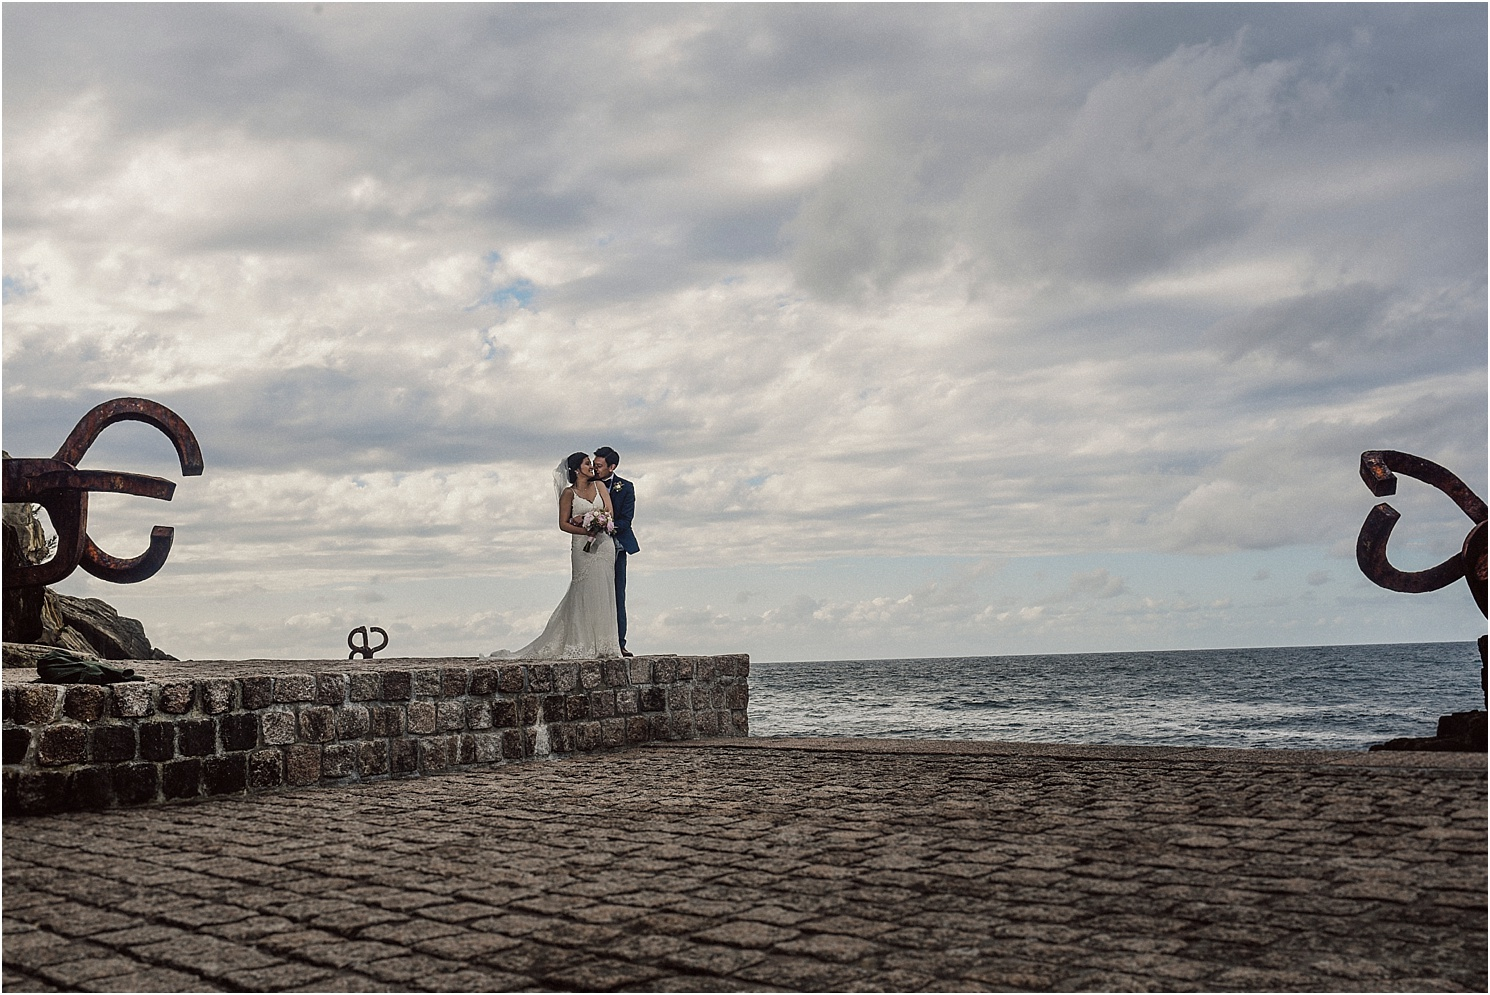 Destination wedding photographer San Sebastian - Destiantion wedding Donostia San Sebastián - Best photographer Basque country_-59.jpg